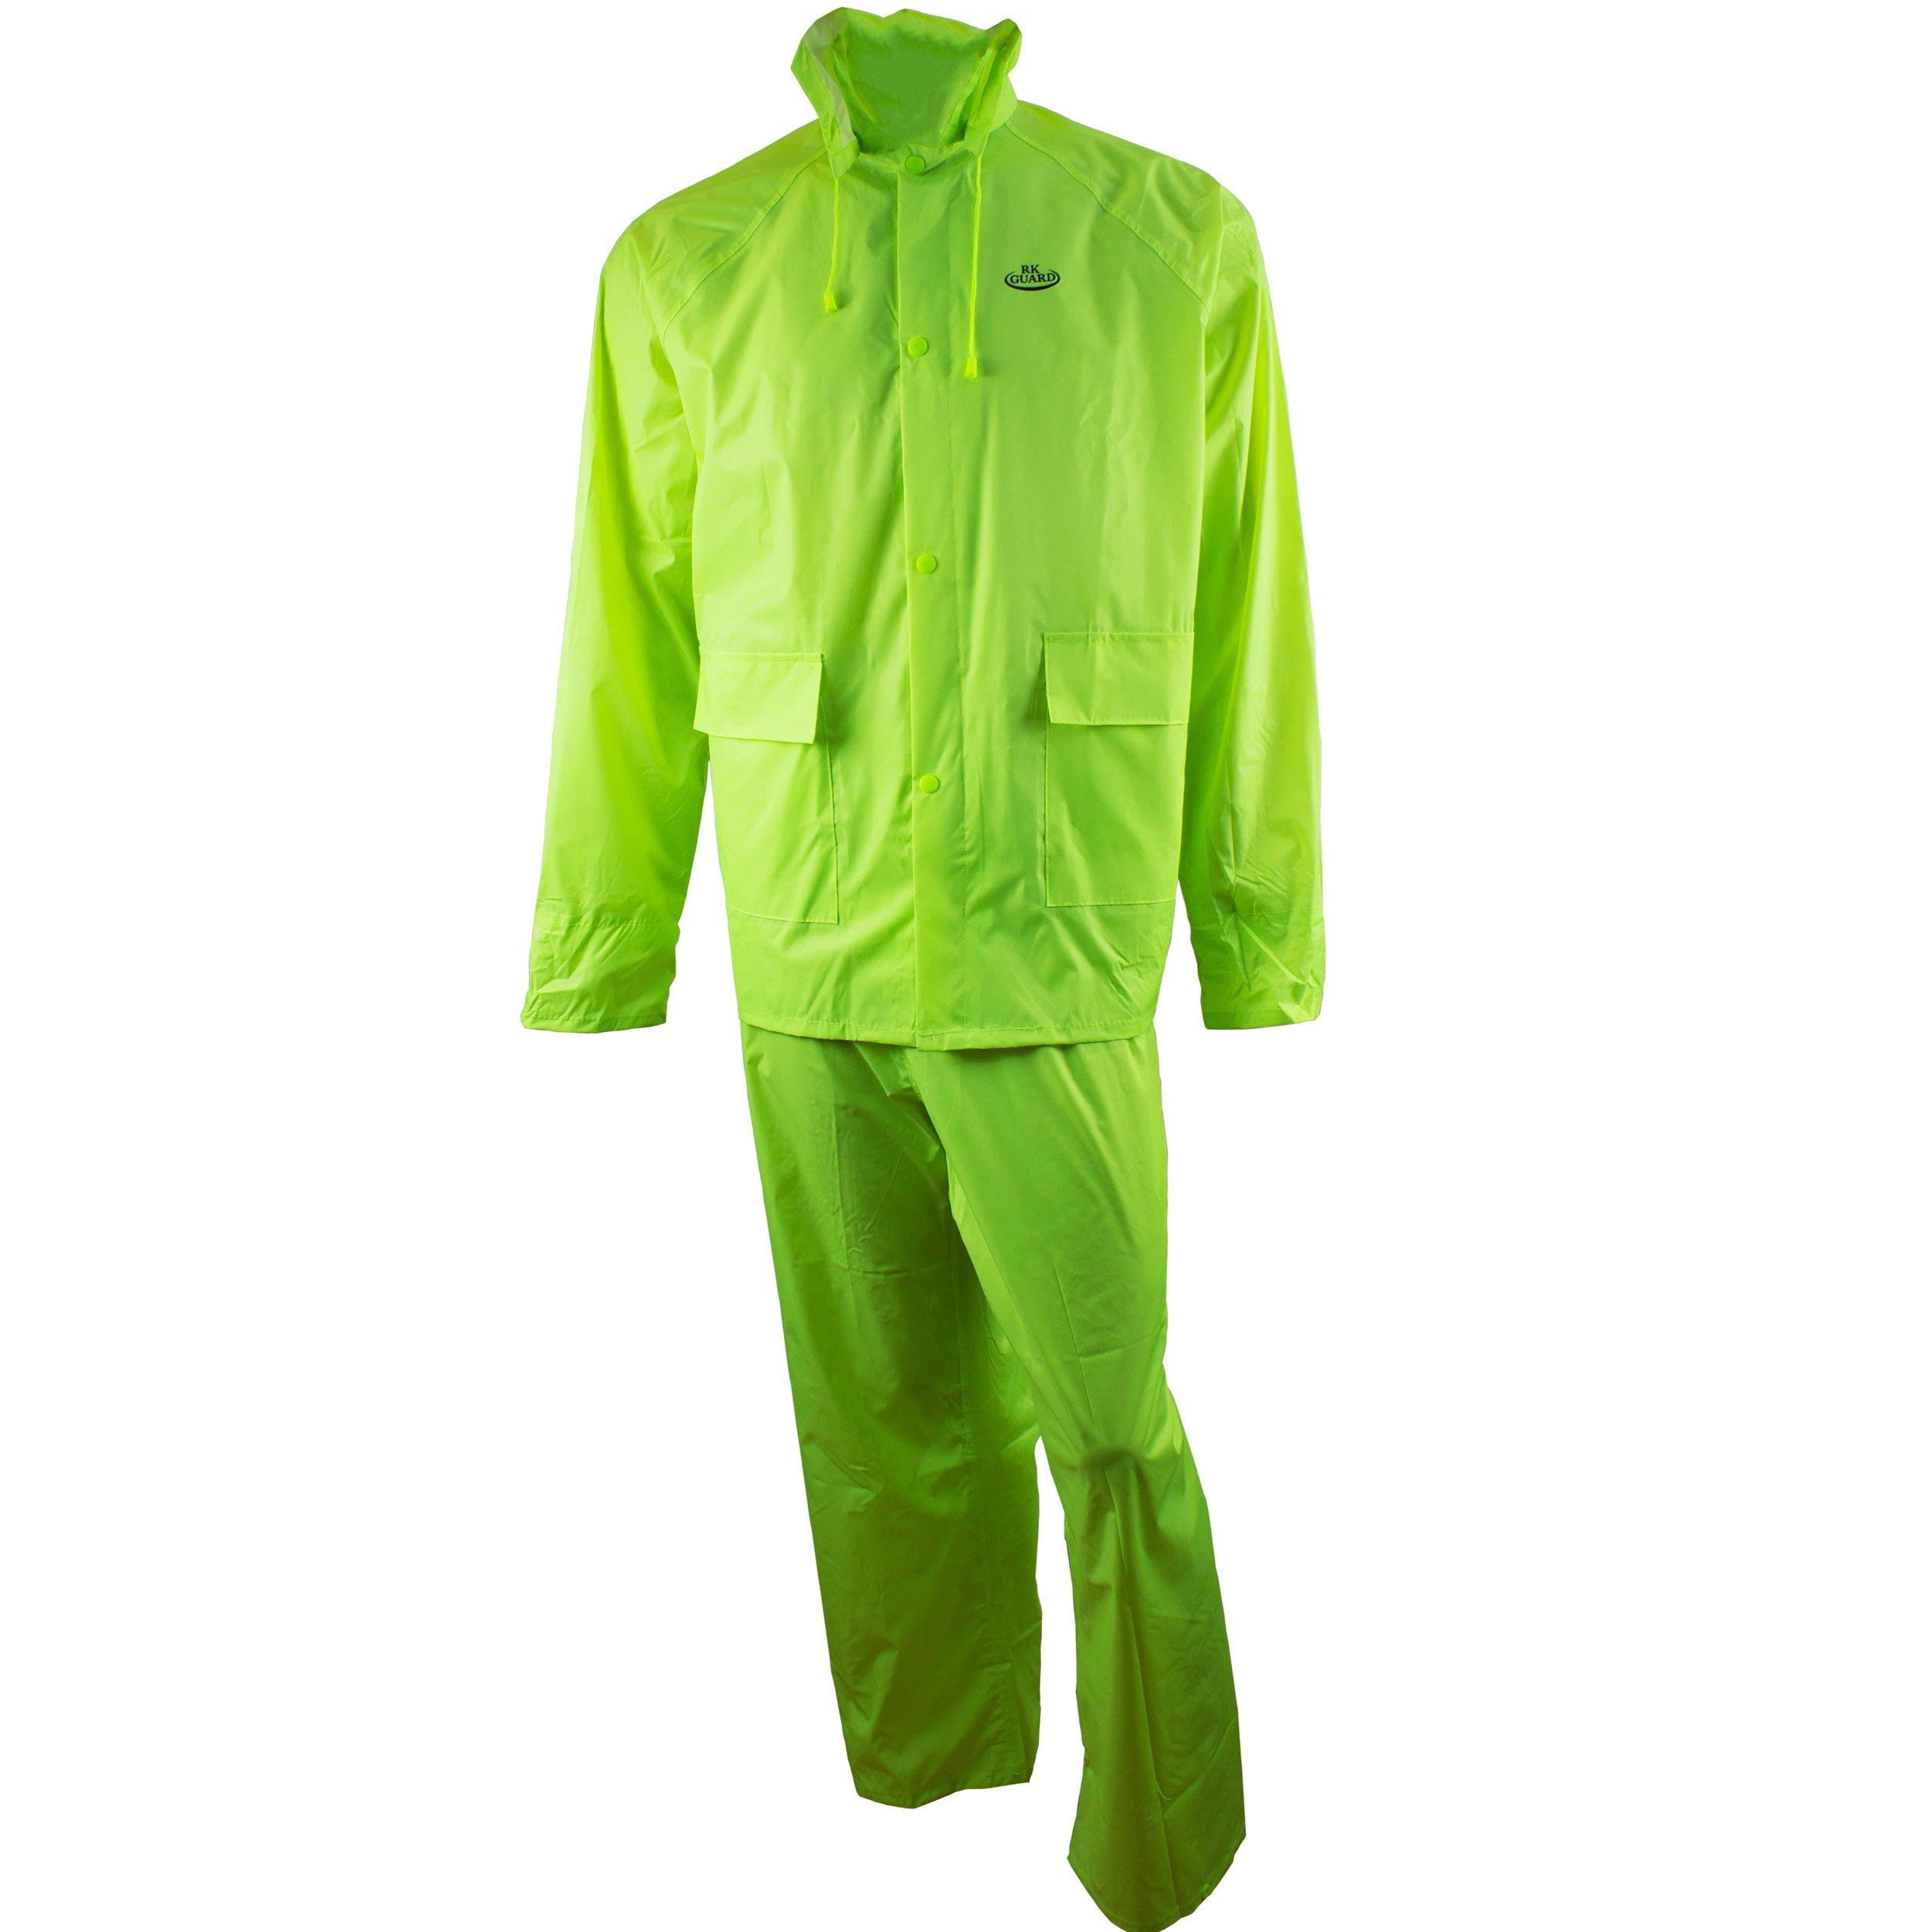 RK Safety Rain Wear RW-PP-HIG33 PVC Polyester 3-Piece Rain Suit | Jacket, Hoodie, Pants (Hi-Vis Green, Medium)